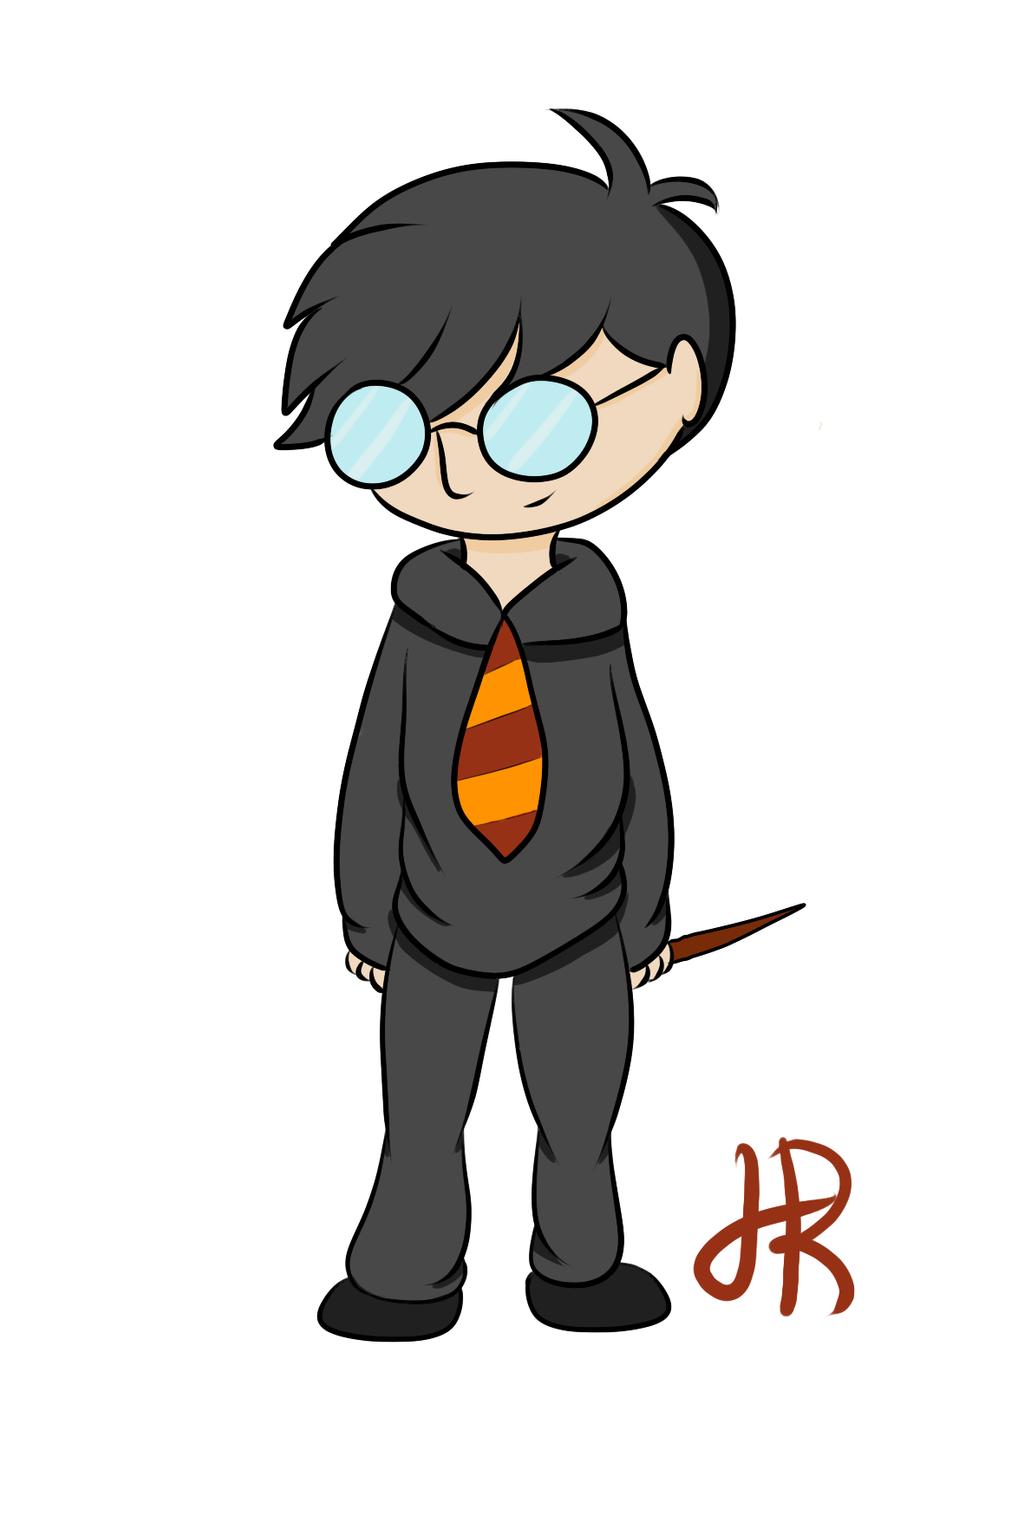 Harry Potter by SkeletalStar